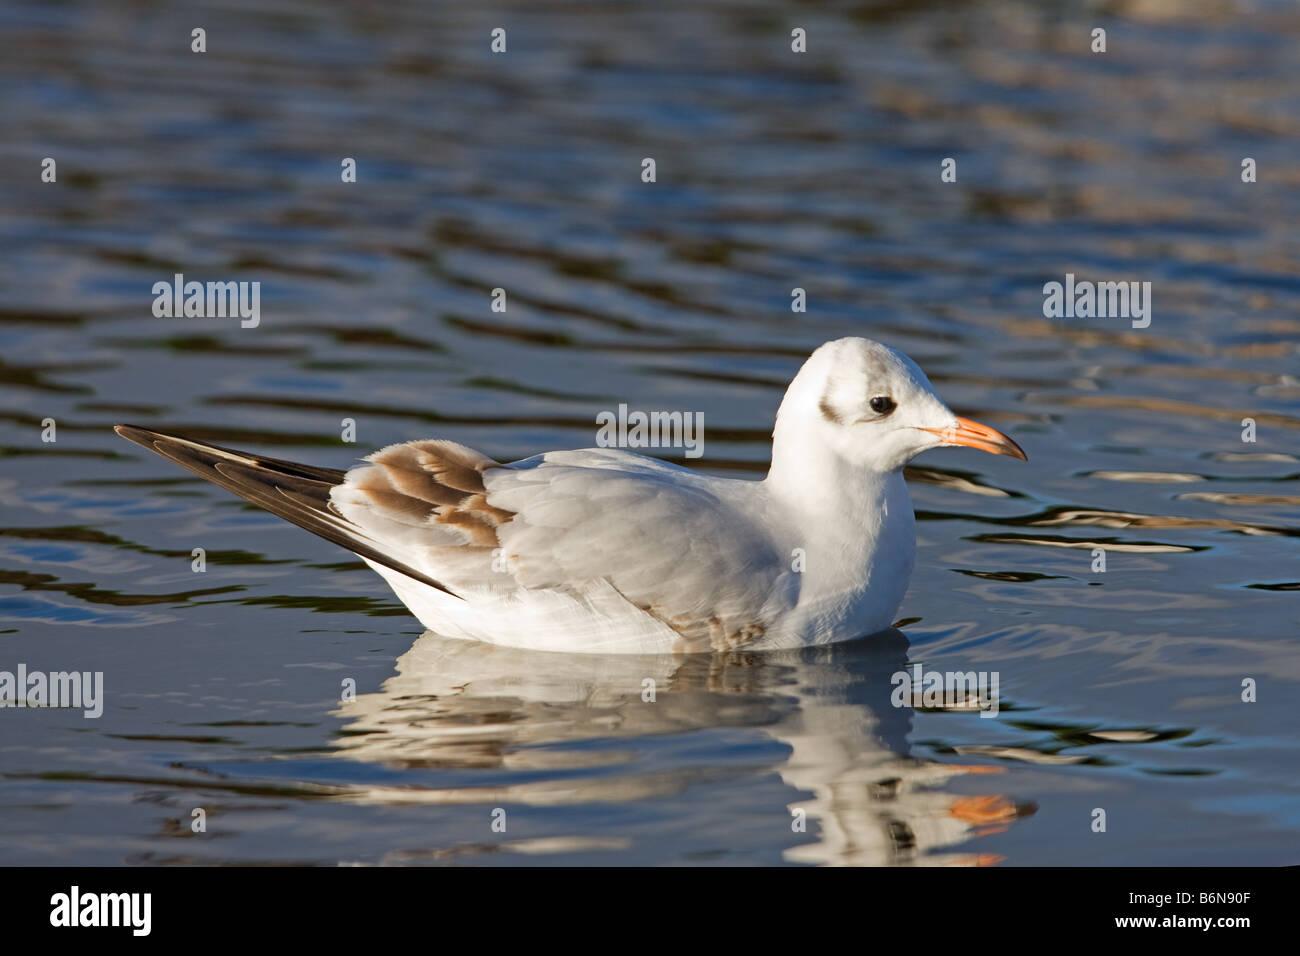 Black-headed Gull Larus ridibundus immature in 1st winter plumage swimming - Stock Image